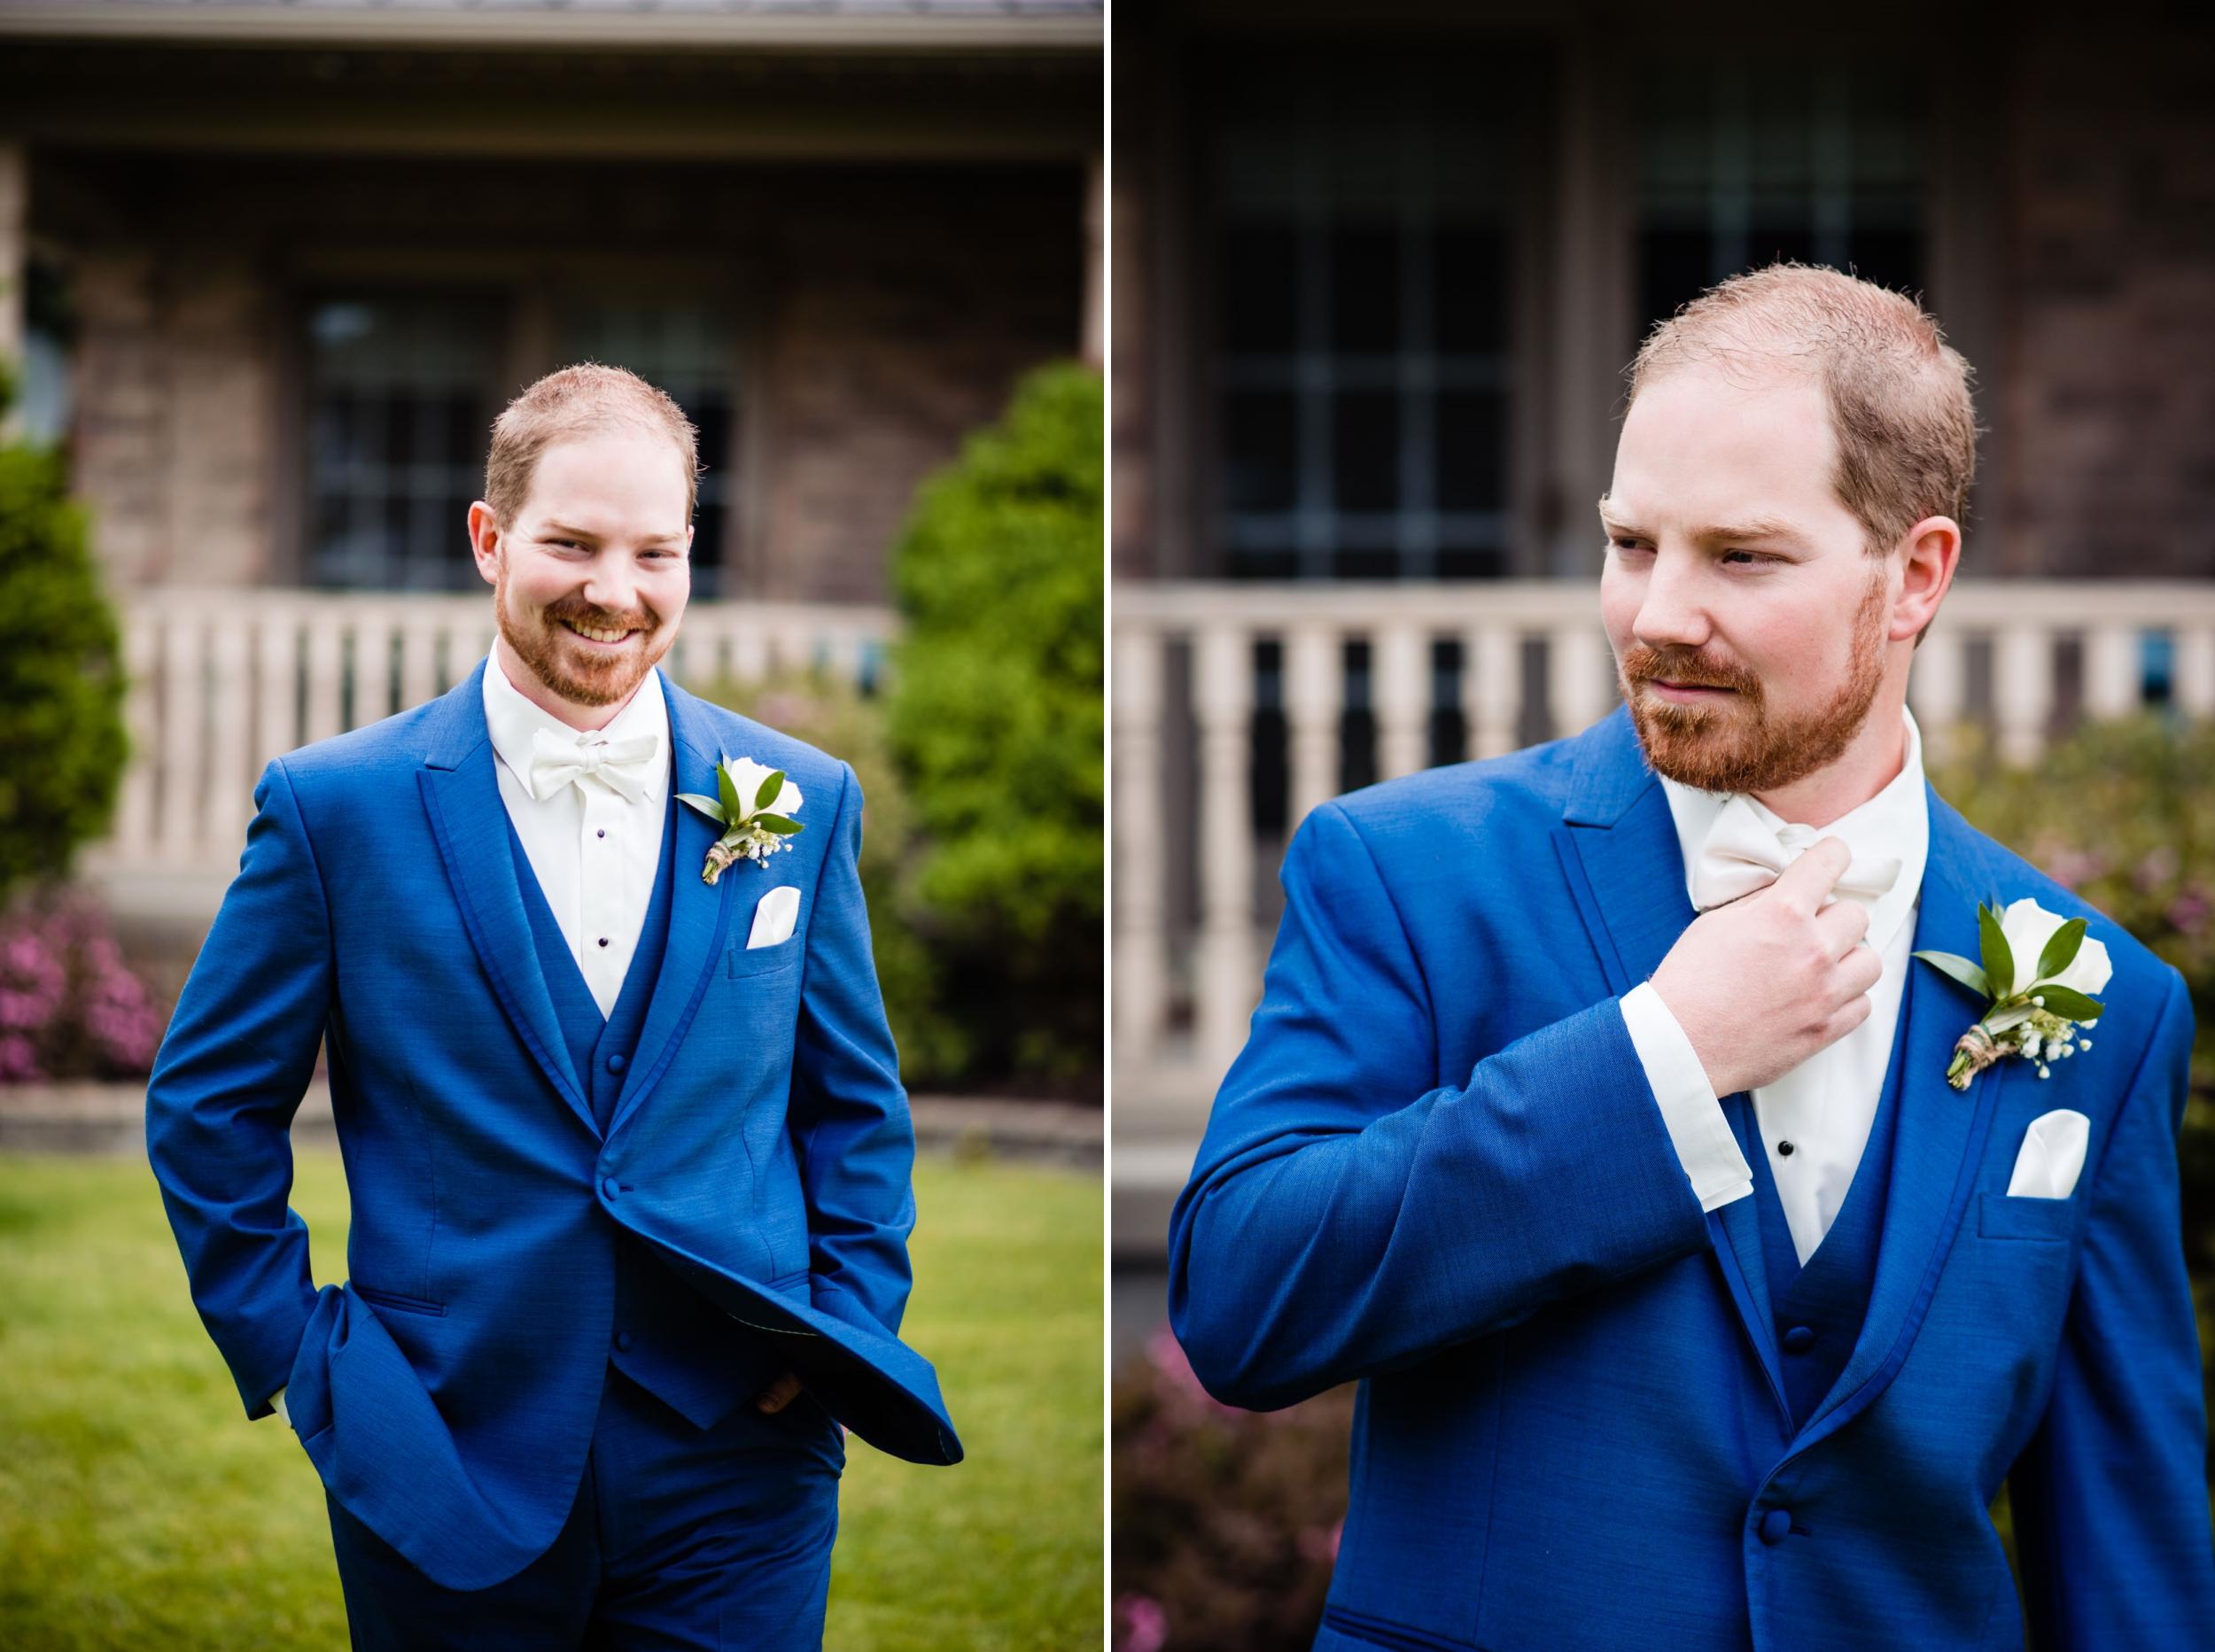 london-ontario-wedding-photography-farm-tent-groom.jpg